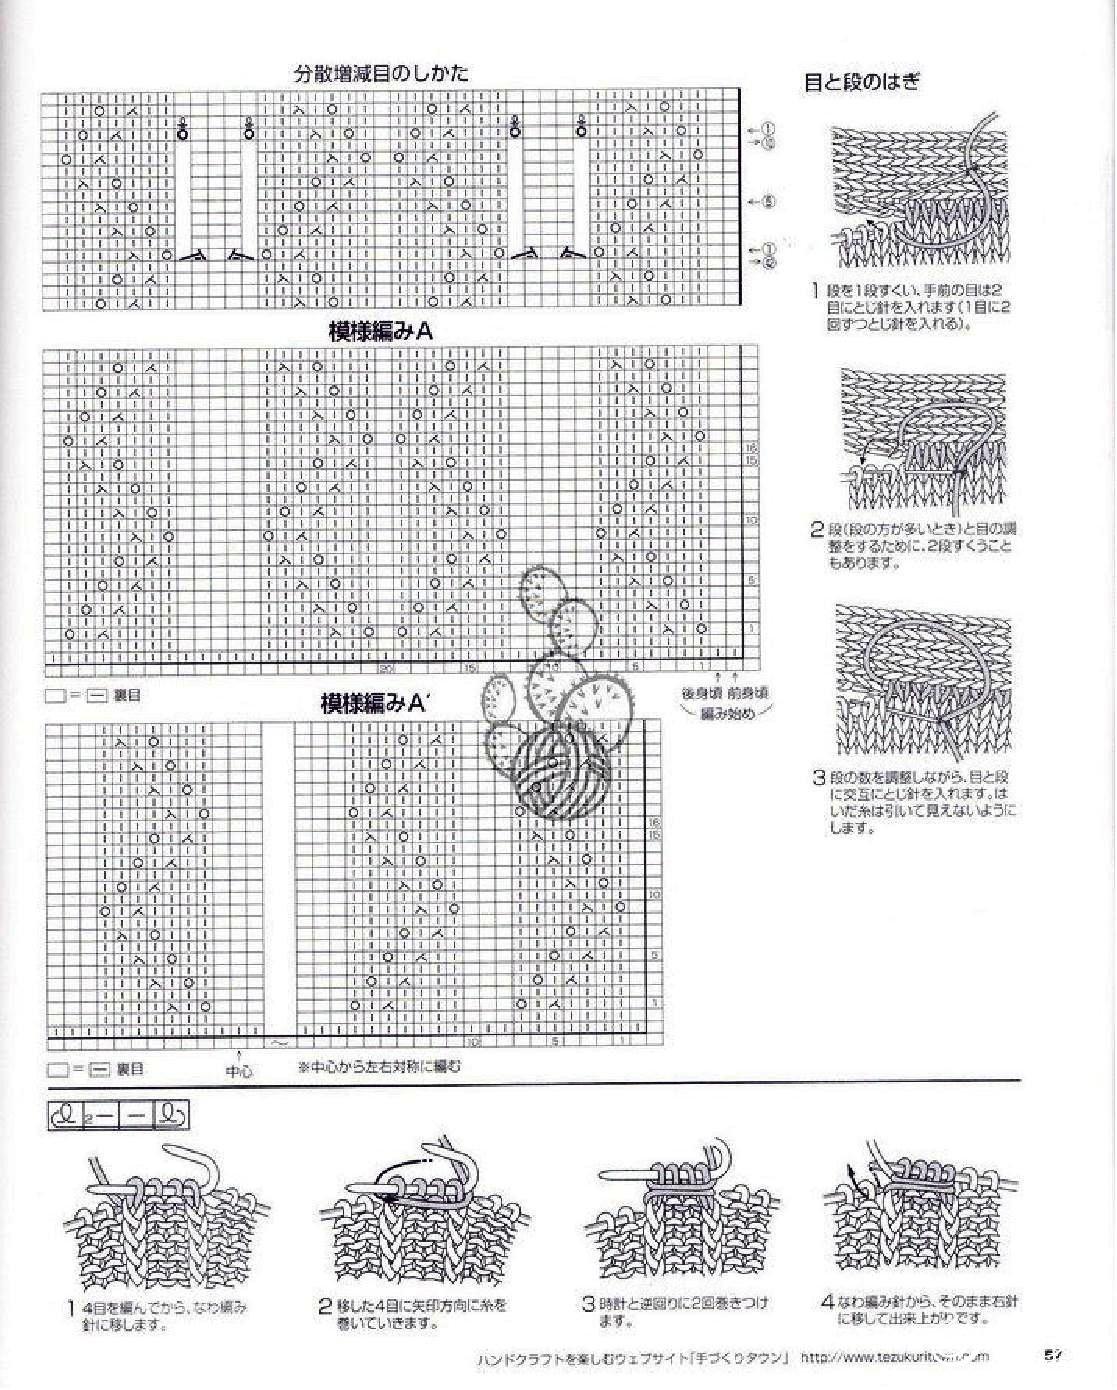 NV80258_page57_image1.jpg